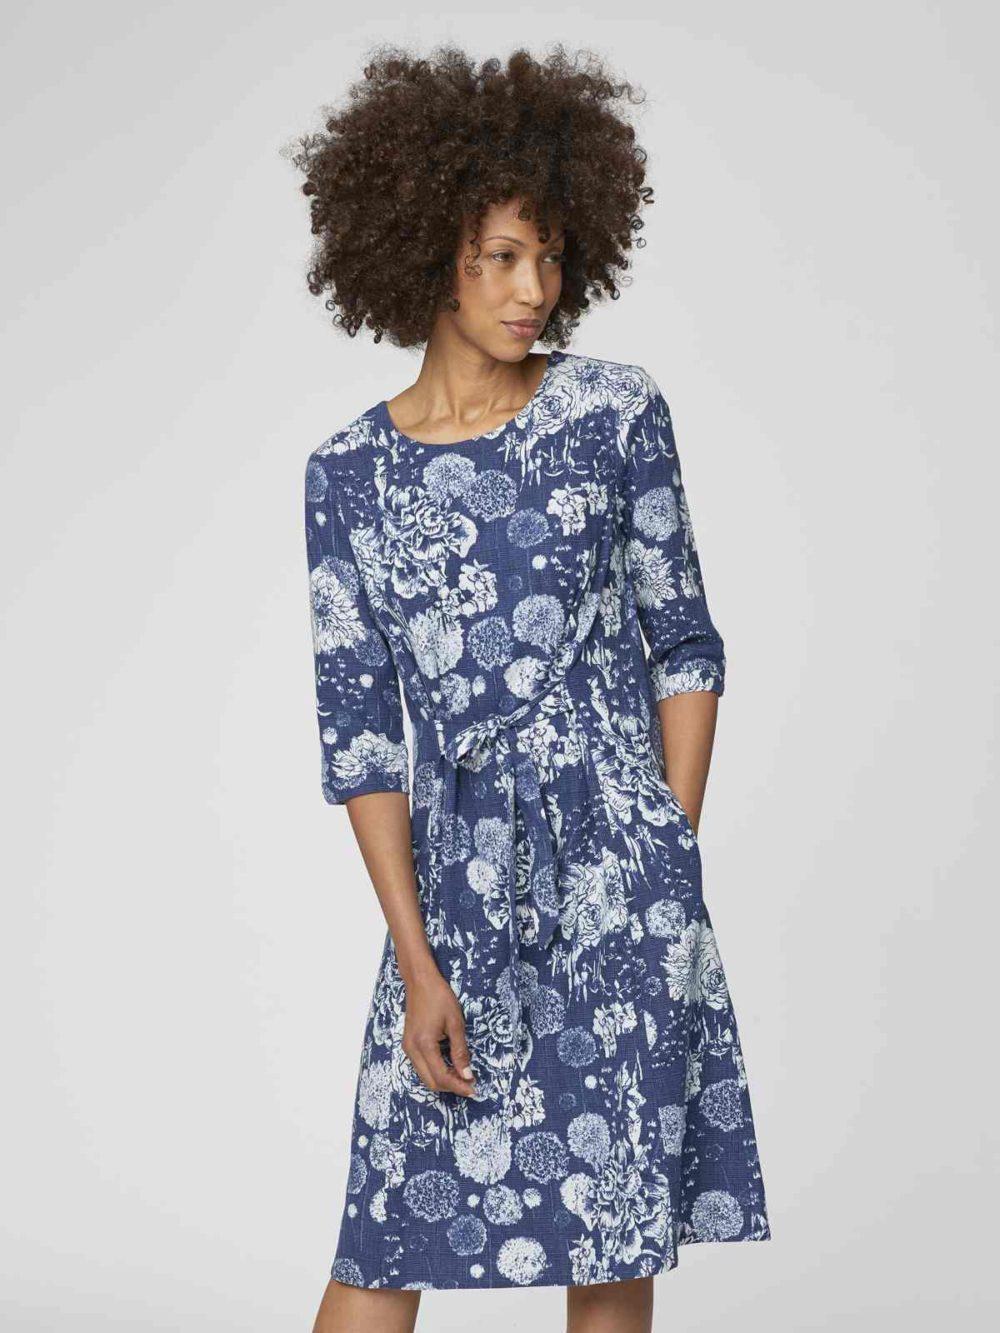 Kikii Dress Thought Clothing Katie Kerr Women's Clothing